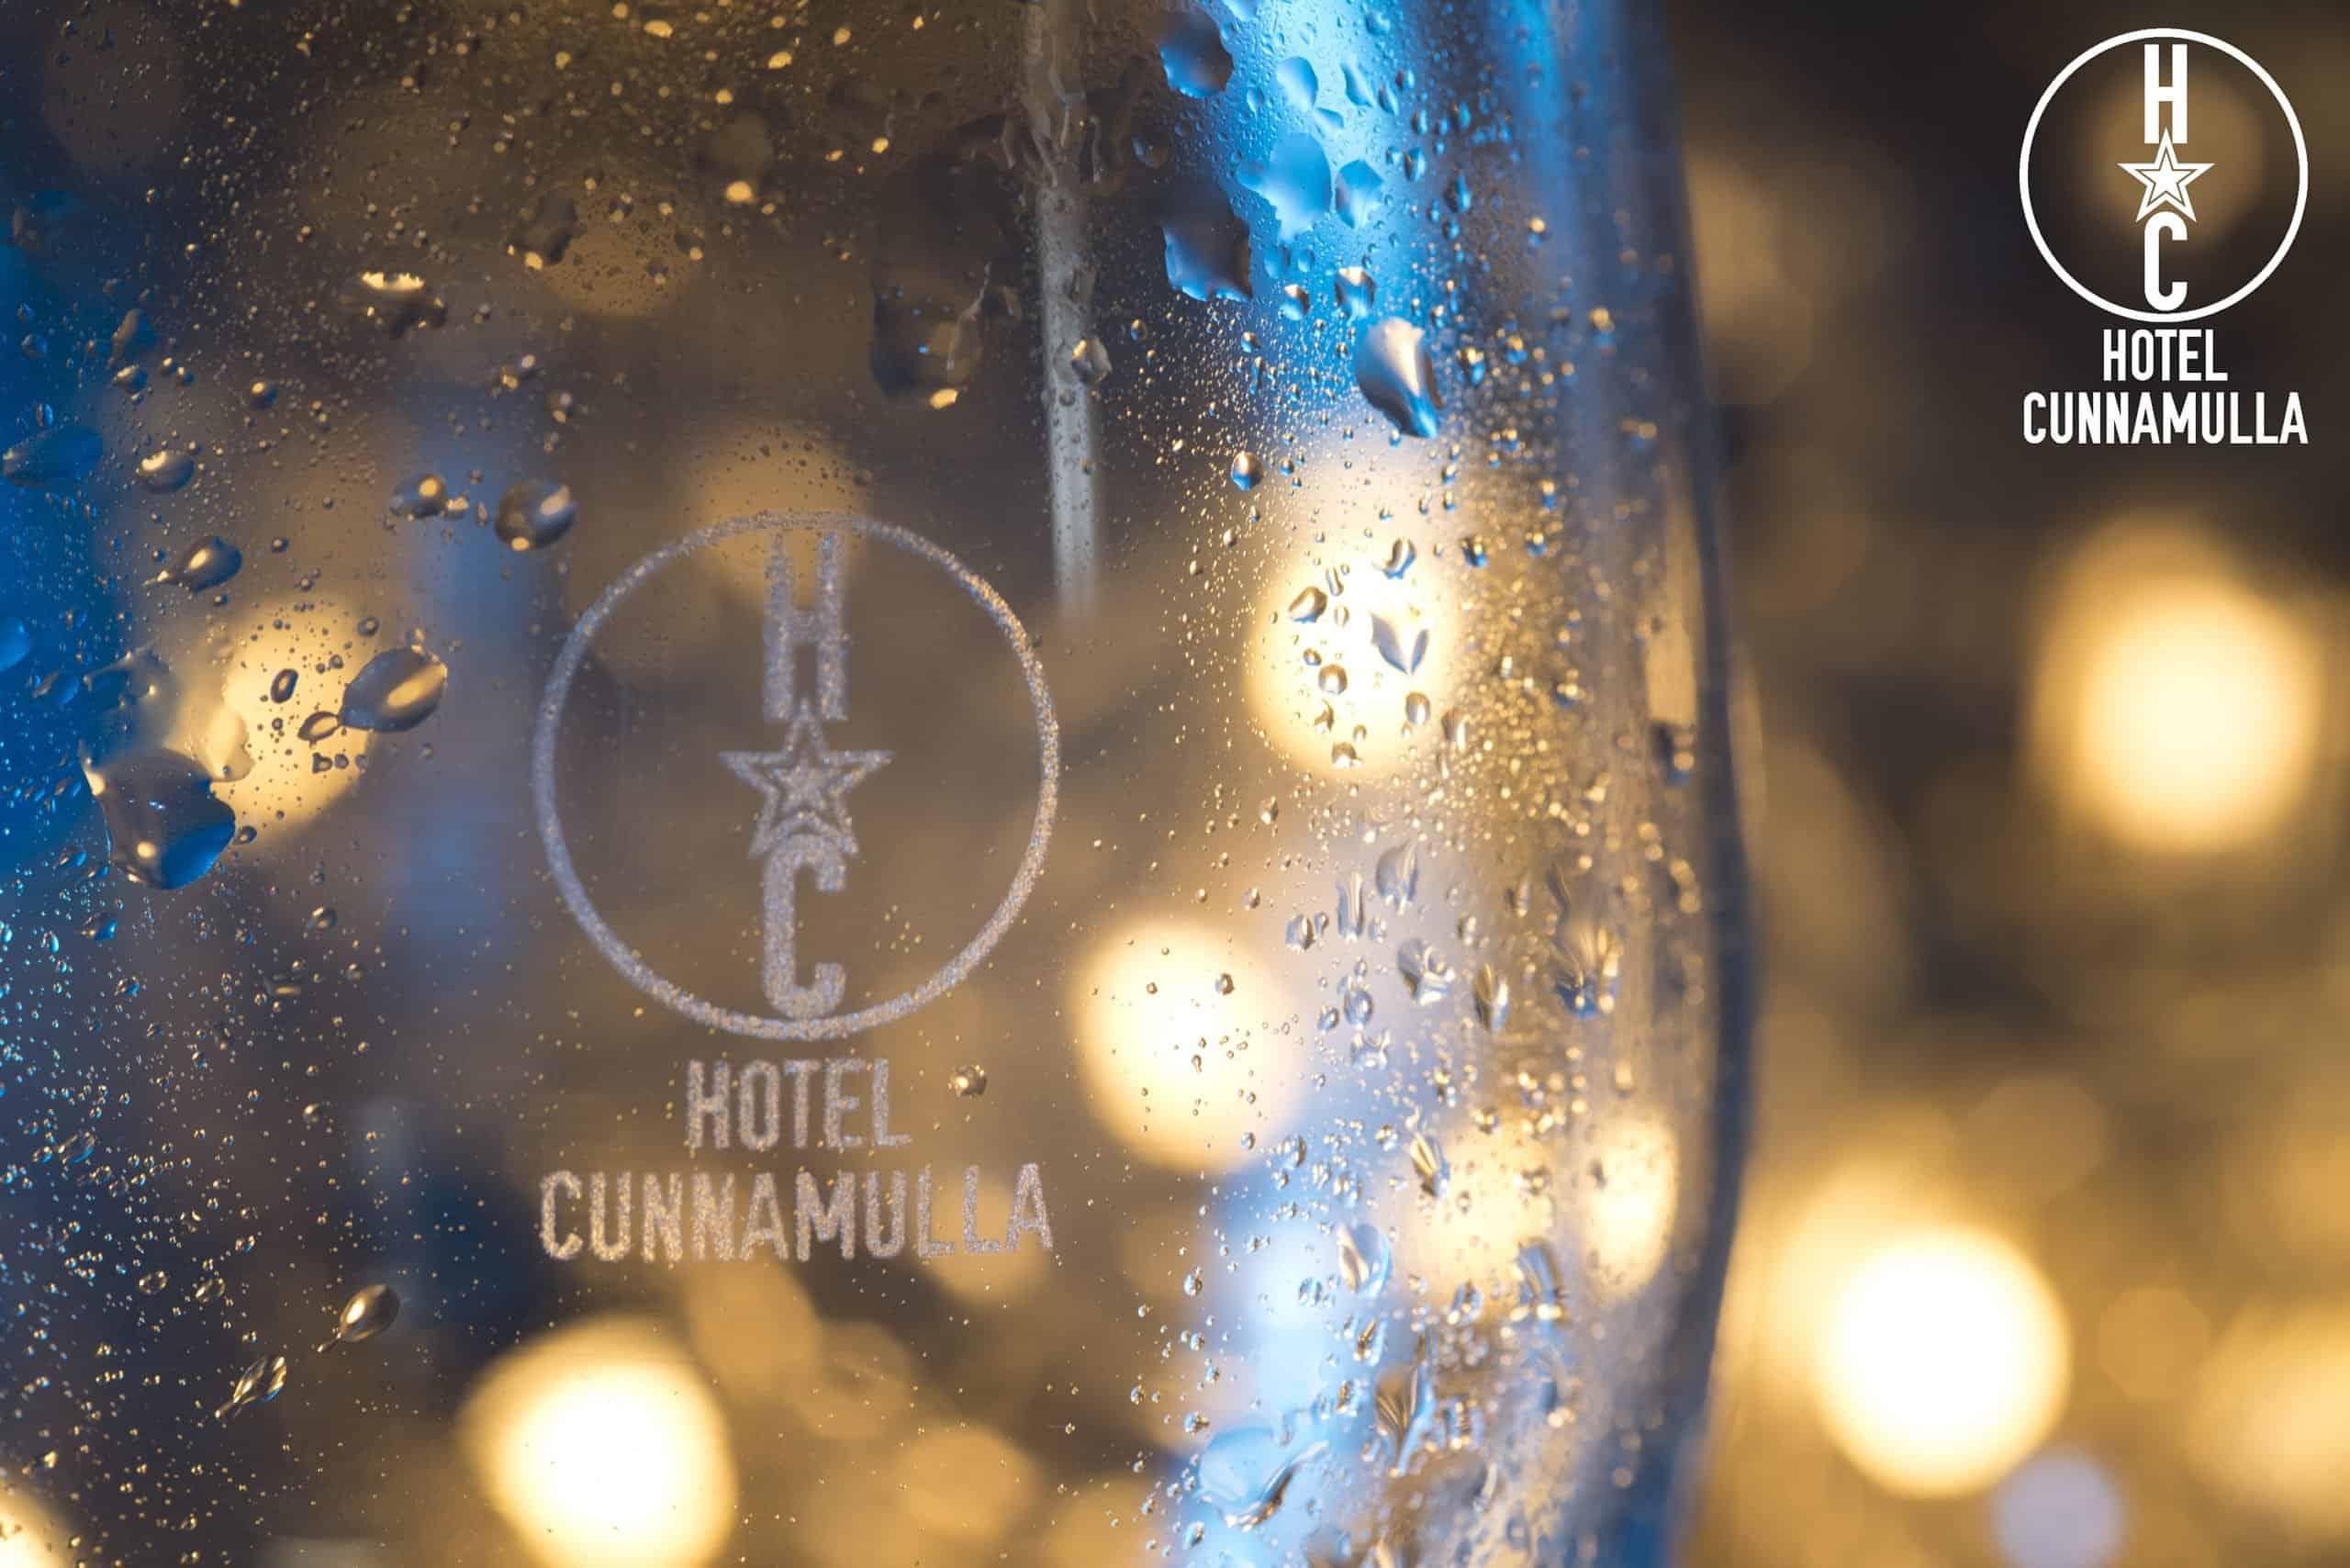 CUNNAMULLA CAFE RESTAURANT TOURISM